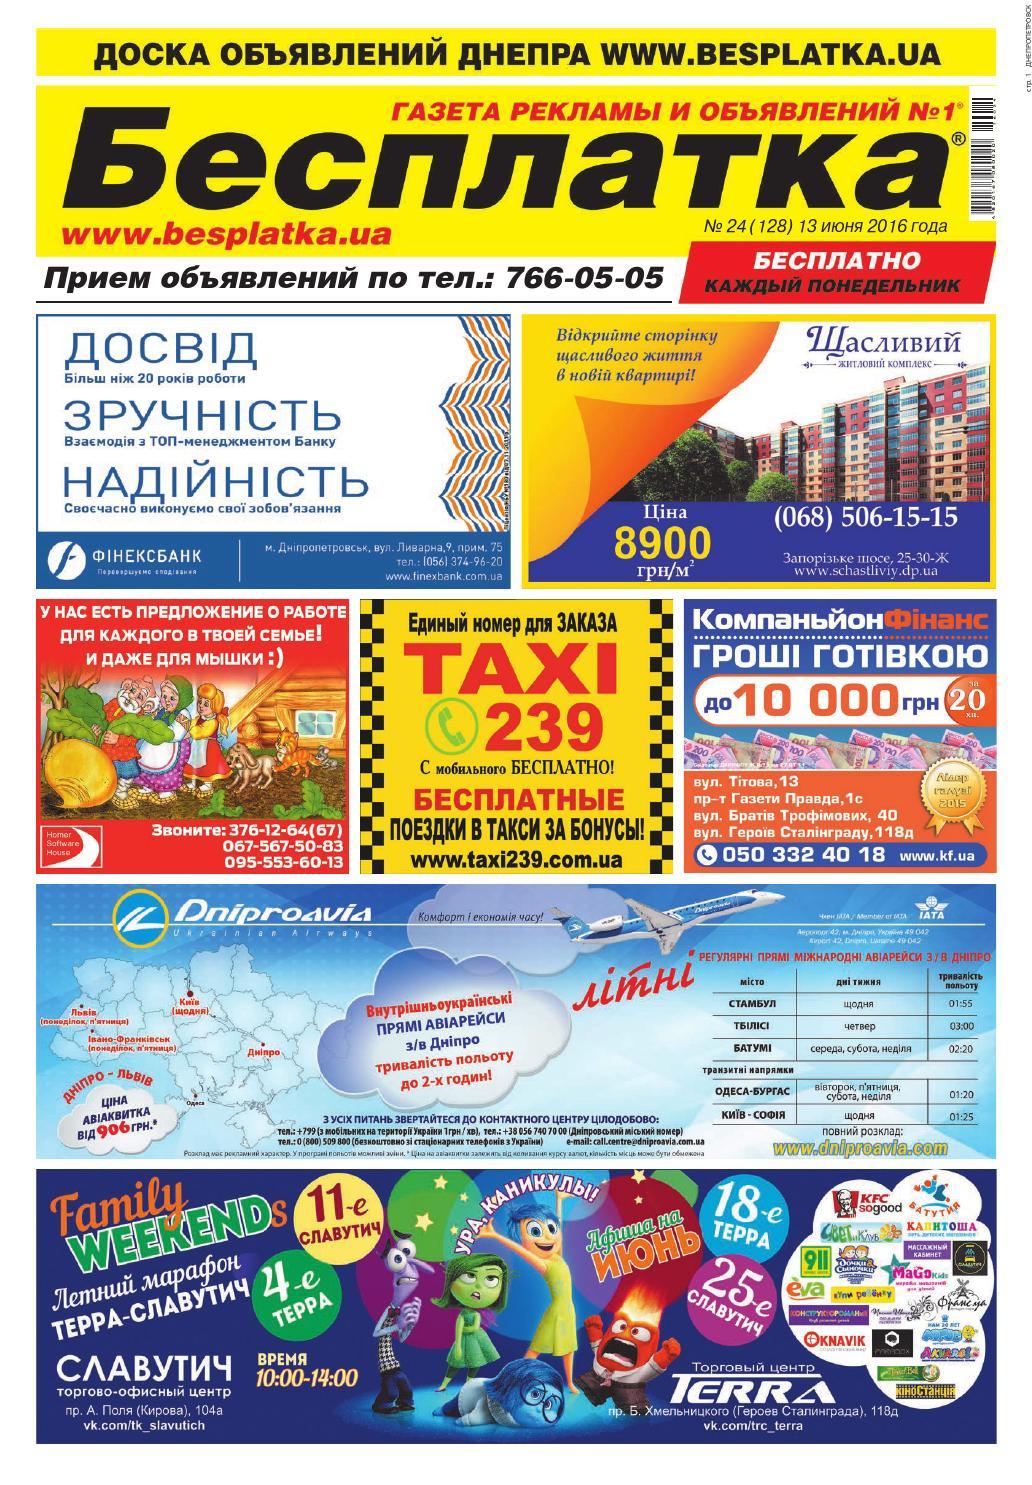 Besplatka  24 Днепр by besplatka ukraine - issuu cfd61fabce464